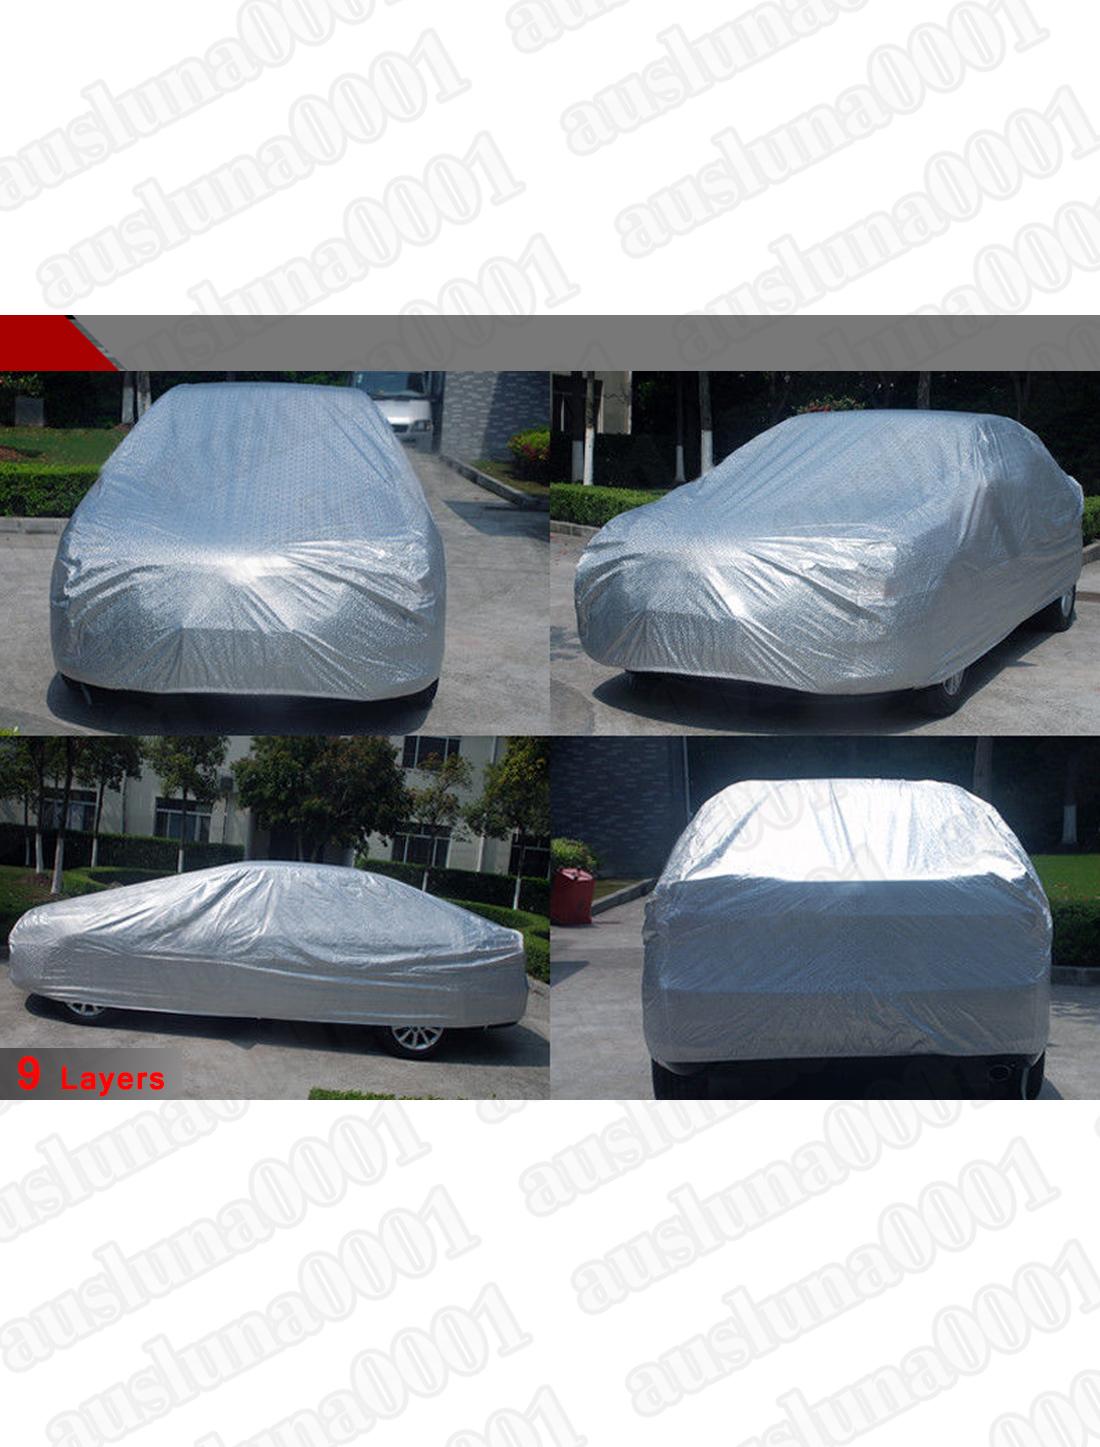 Aluminum Car Cover : Stormproof waterproof layers aluminum car cover outdoor